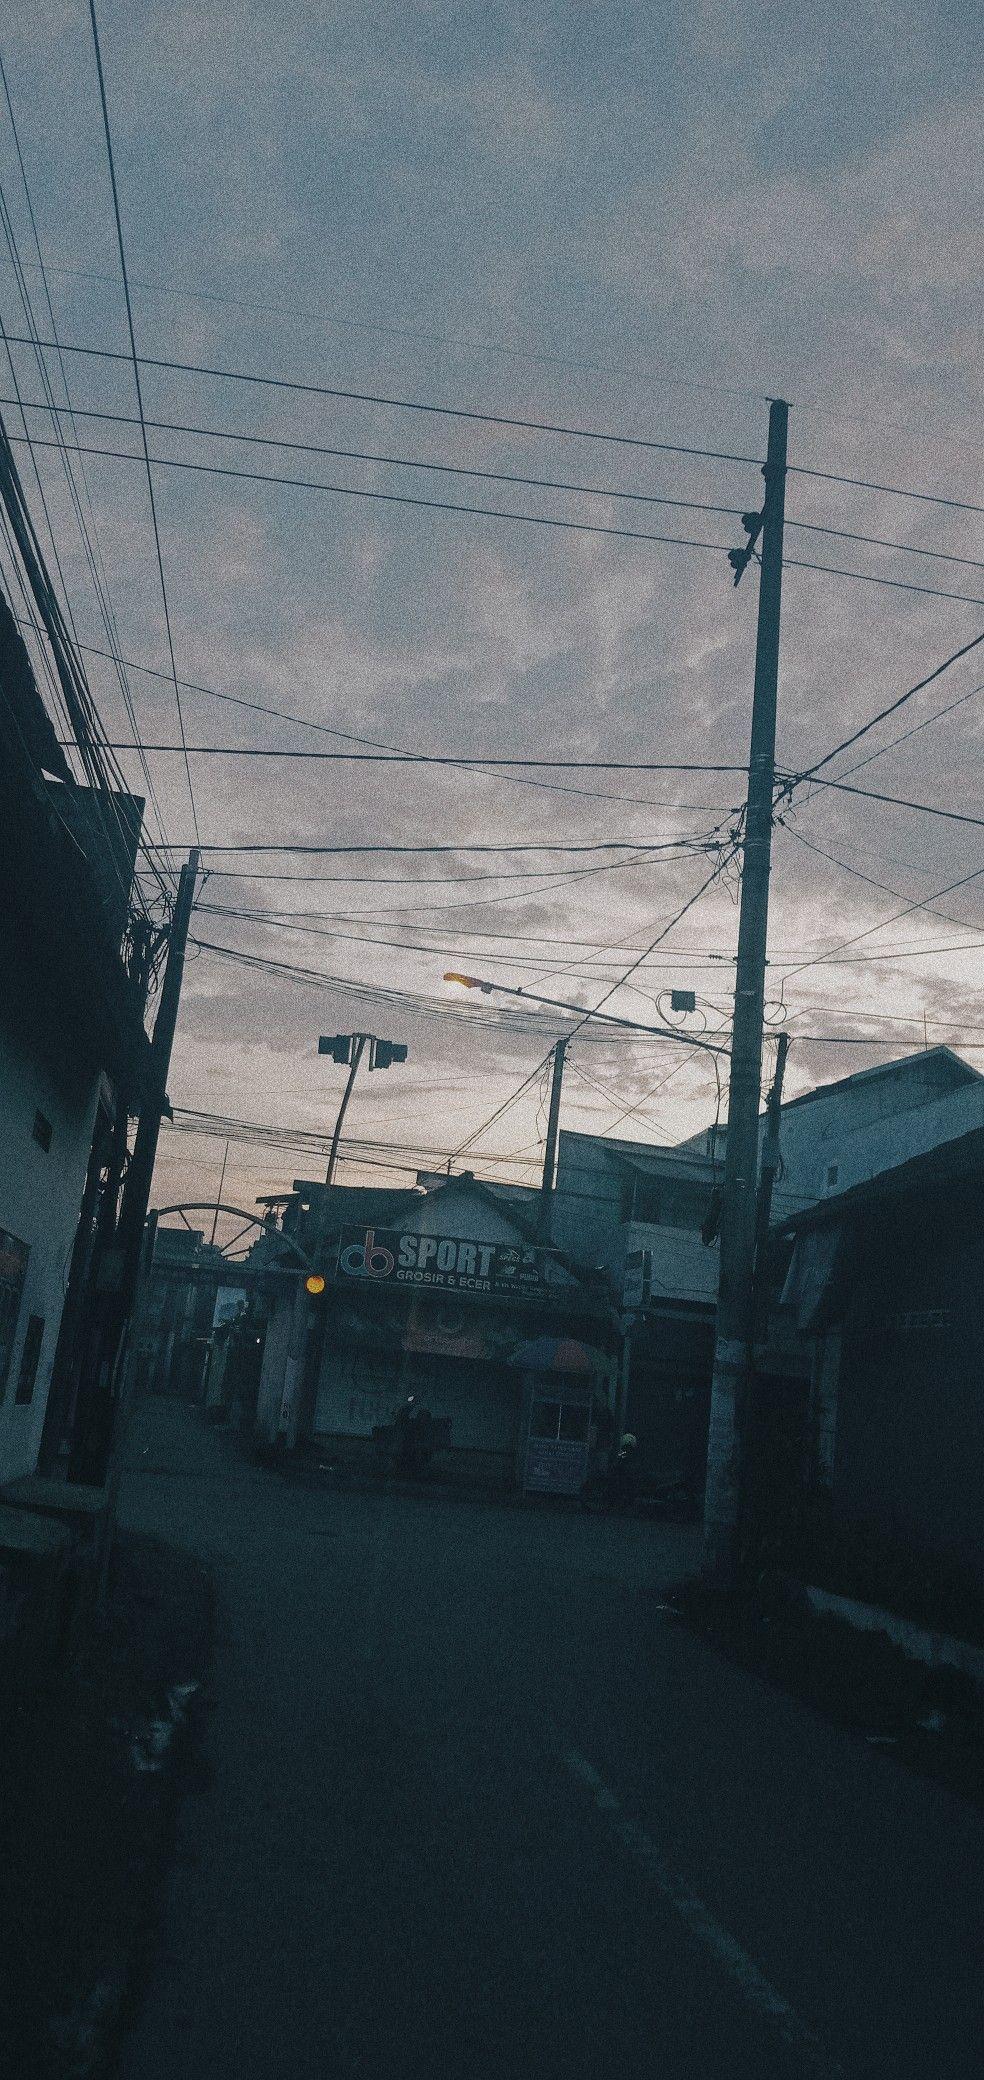 Sejenis Senja Tapi Di Pagi Hari Pagi Senja Langit Awan Suasana Cuaca Matahari Langit Pemandangan Awan